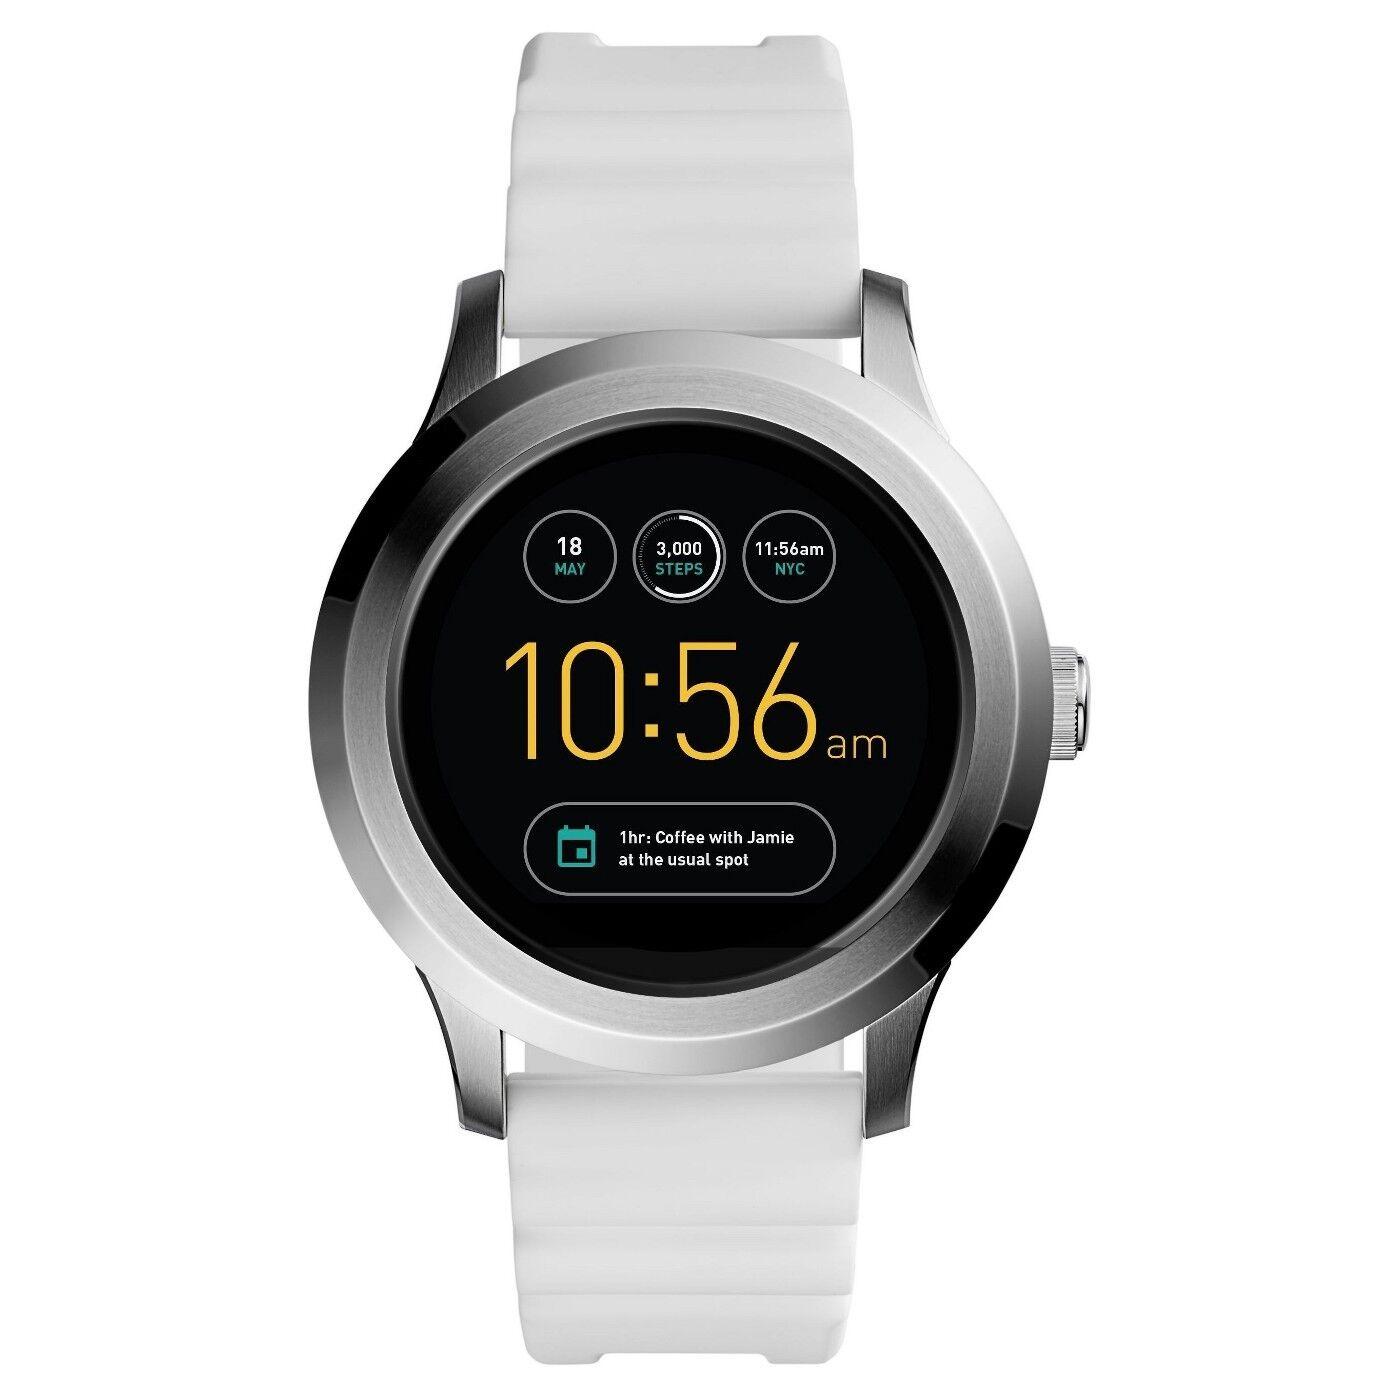 FTW2115 - NEW Fossil Gen 2 Smartwatch - Q Founder White Sili